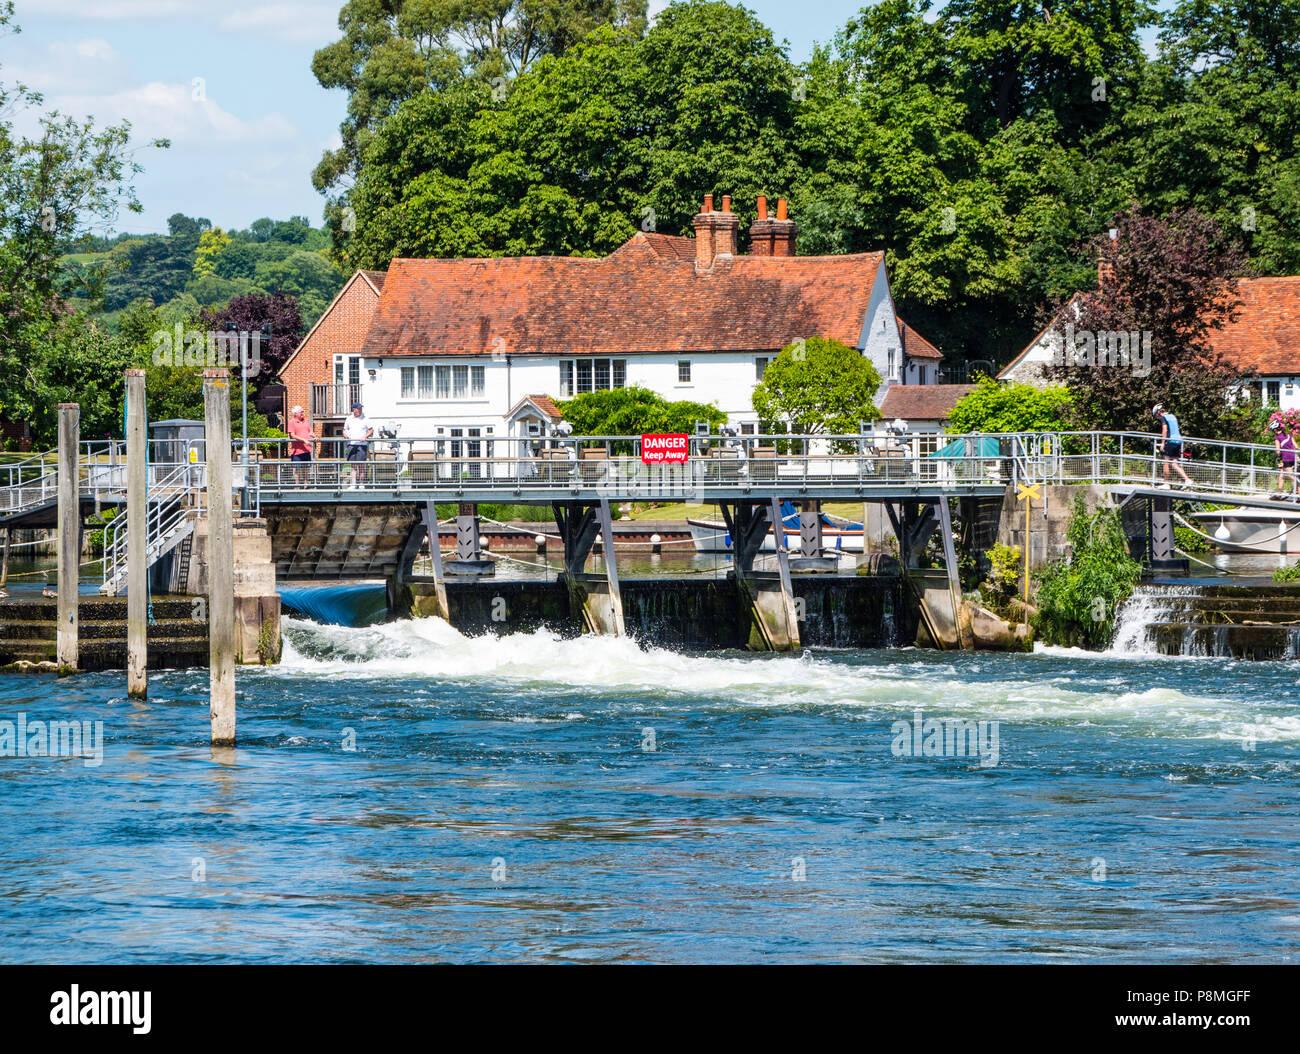 People Walking Across Weir, Hambleden Lock and Weir, River Thames, Berkshire, England, UK, GB. - Stock Image